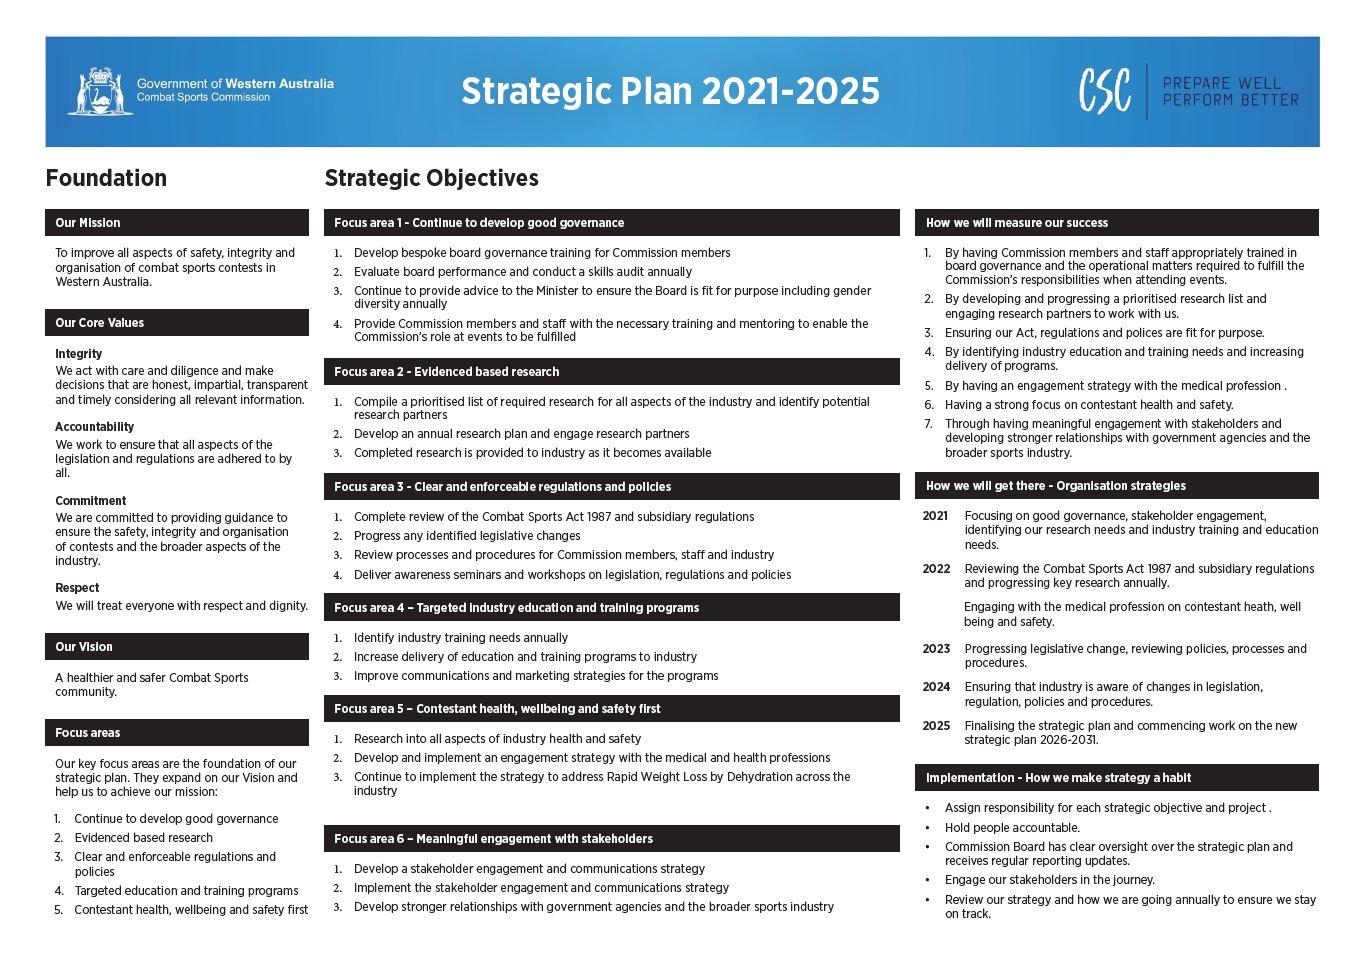 Combat Sports Commission Strategic Plan 2021-2025 cover